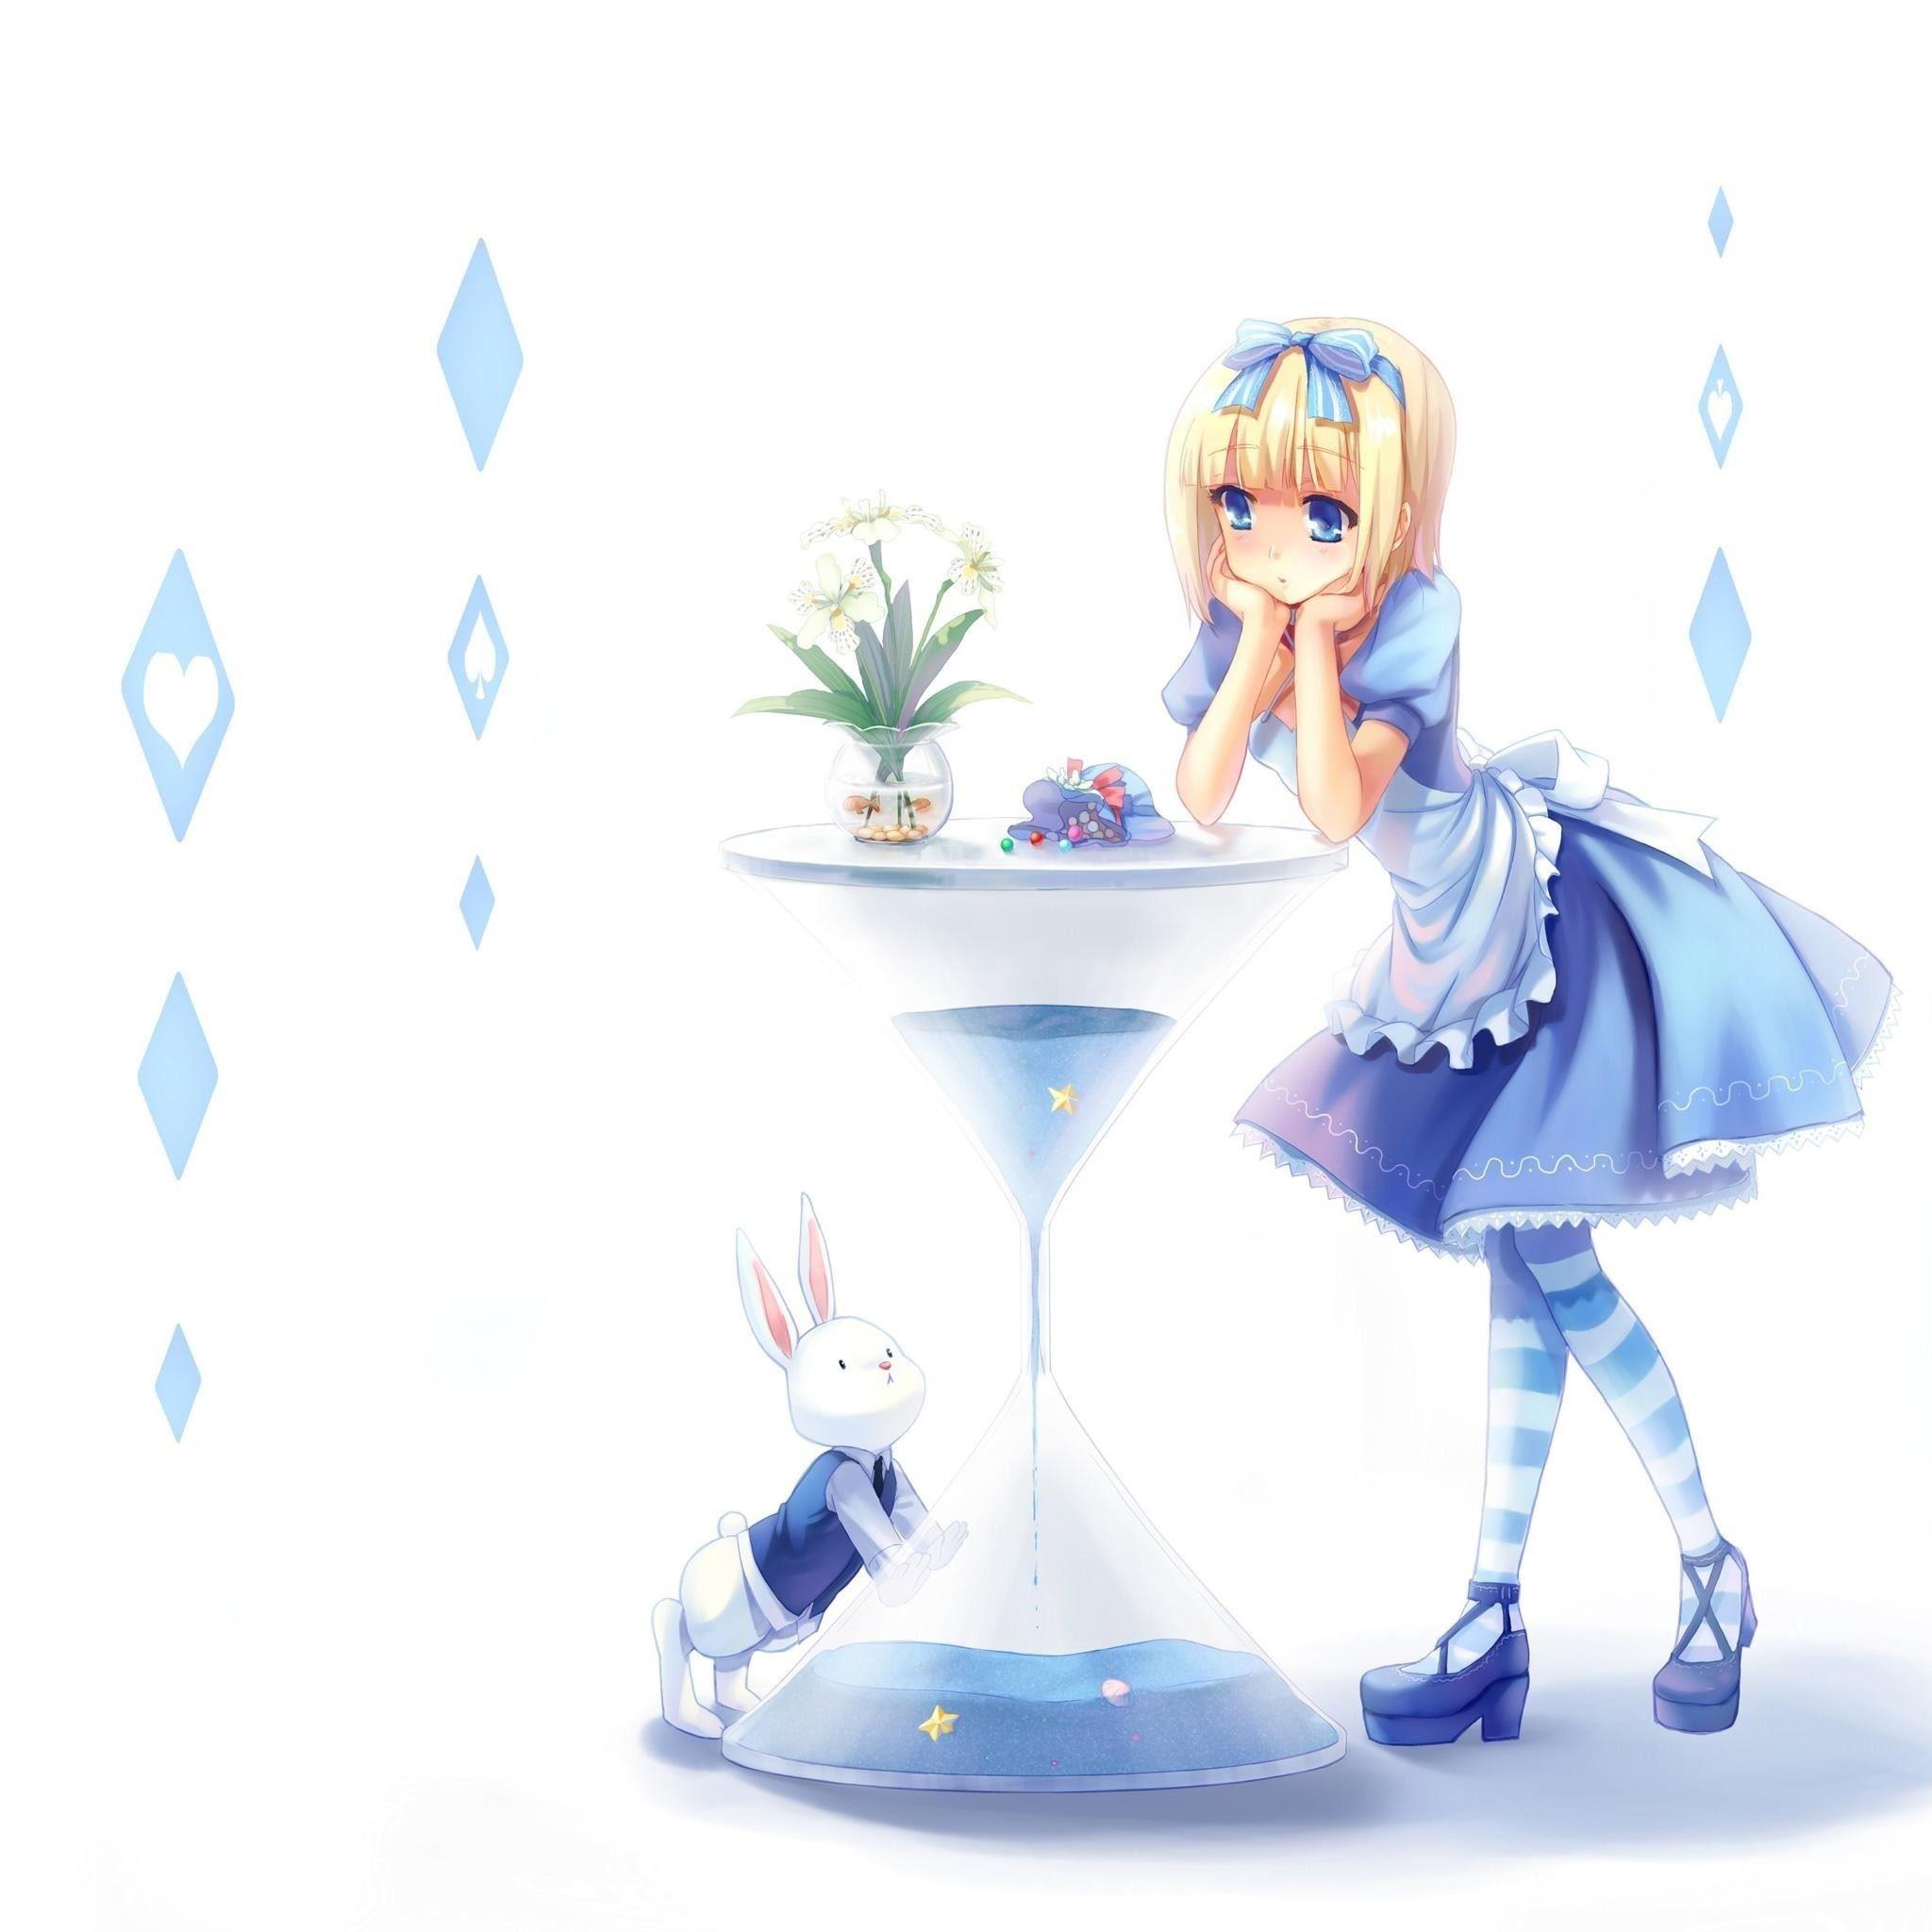 Best Anime Ipad Air Wallpapers Hd Ilikewallpaper